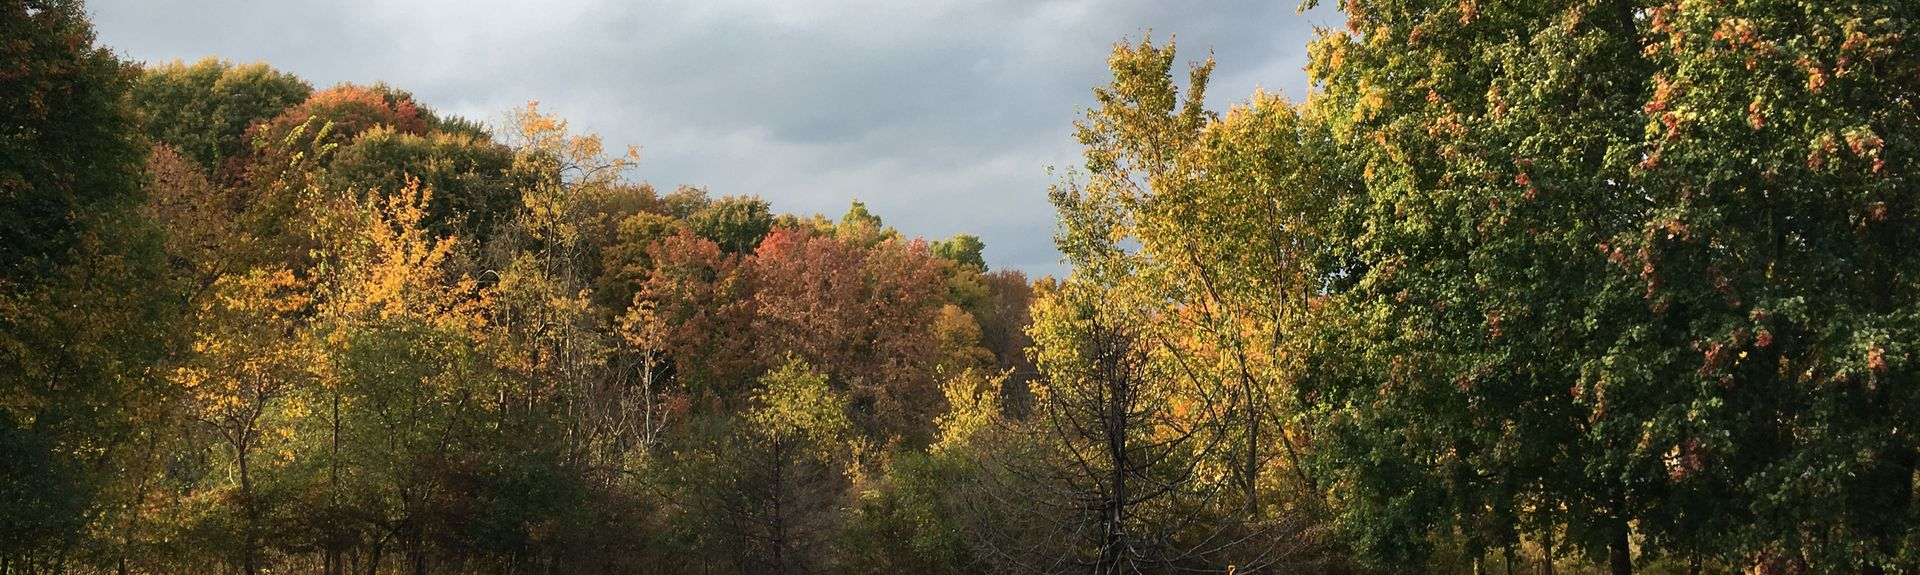 Summit County, Ohio, Verenigde Staten